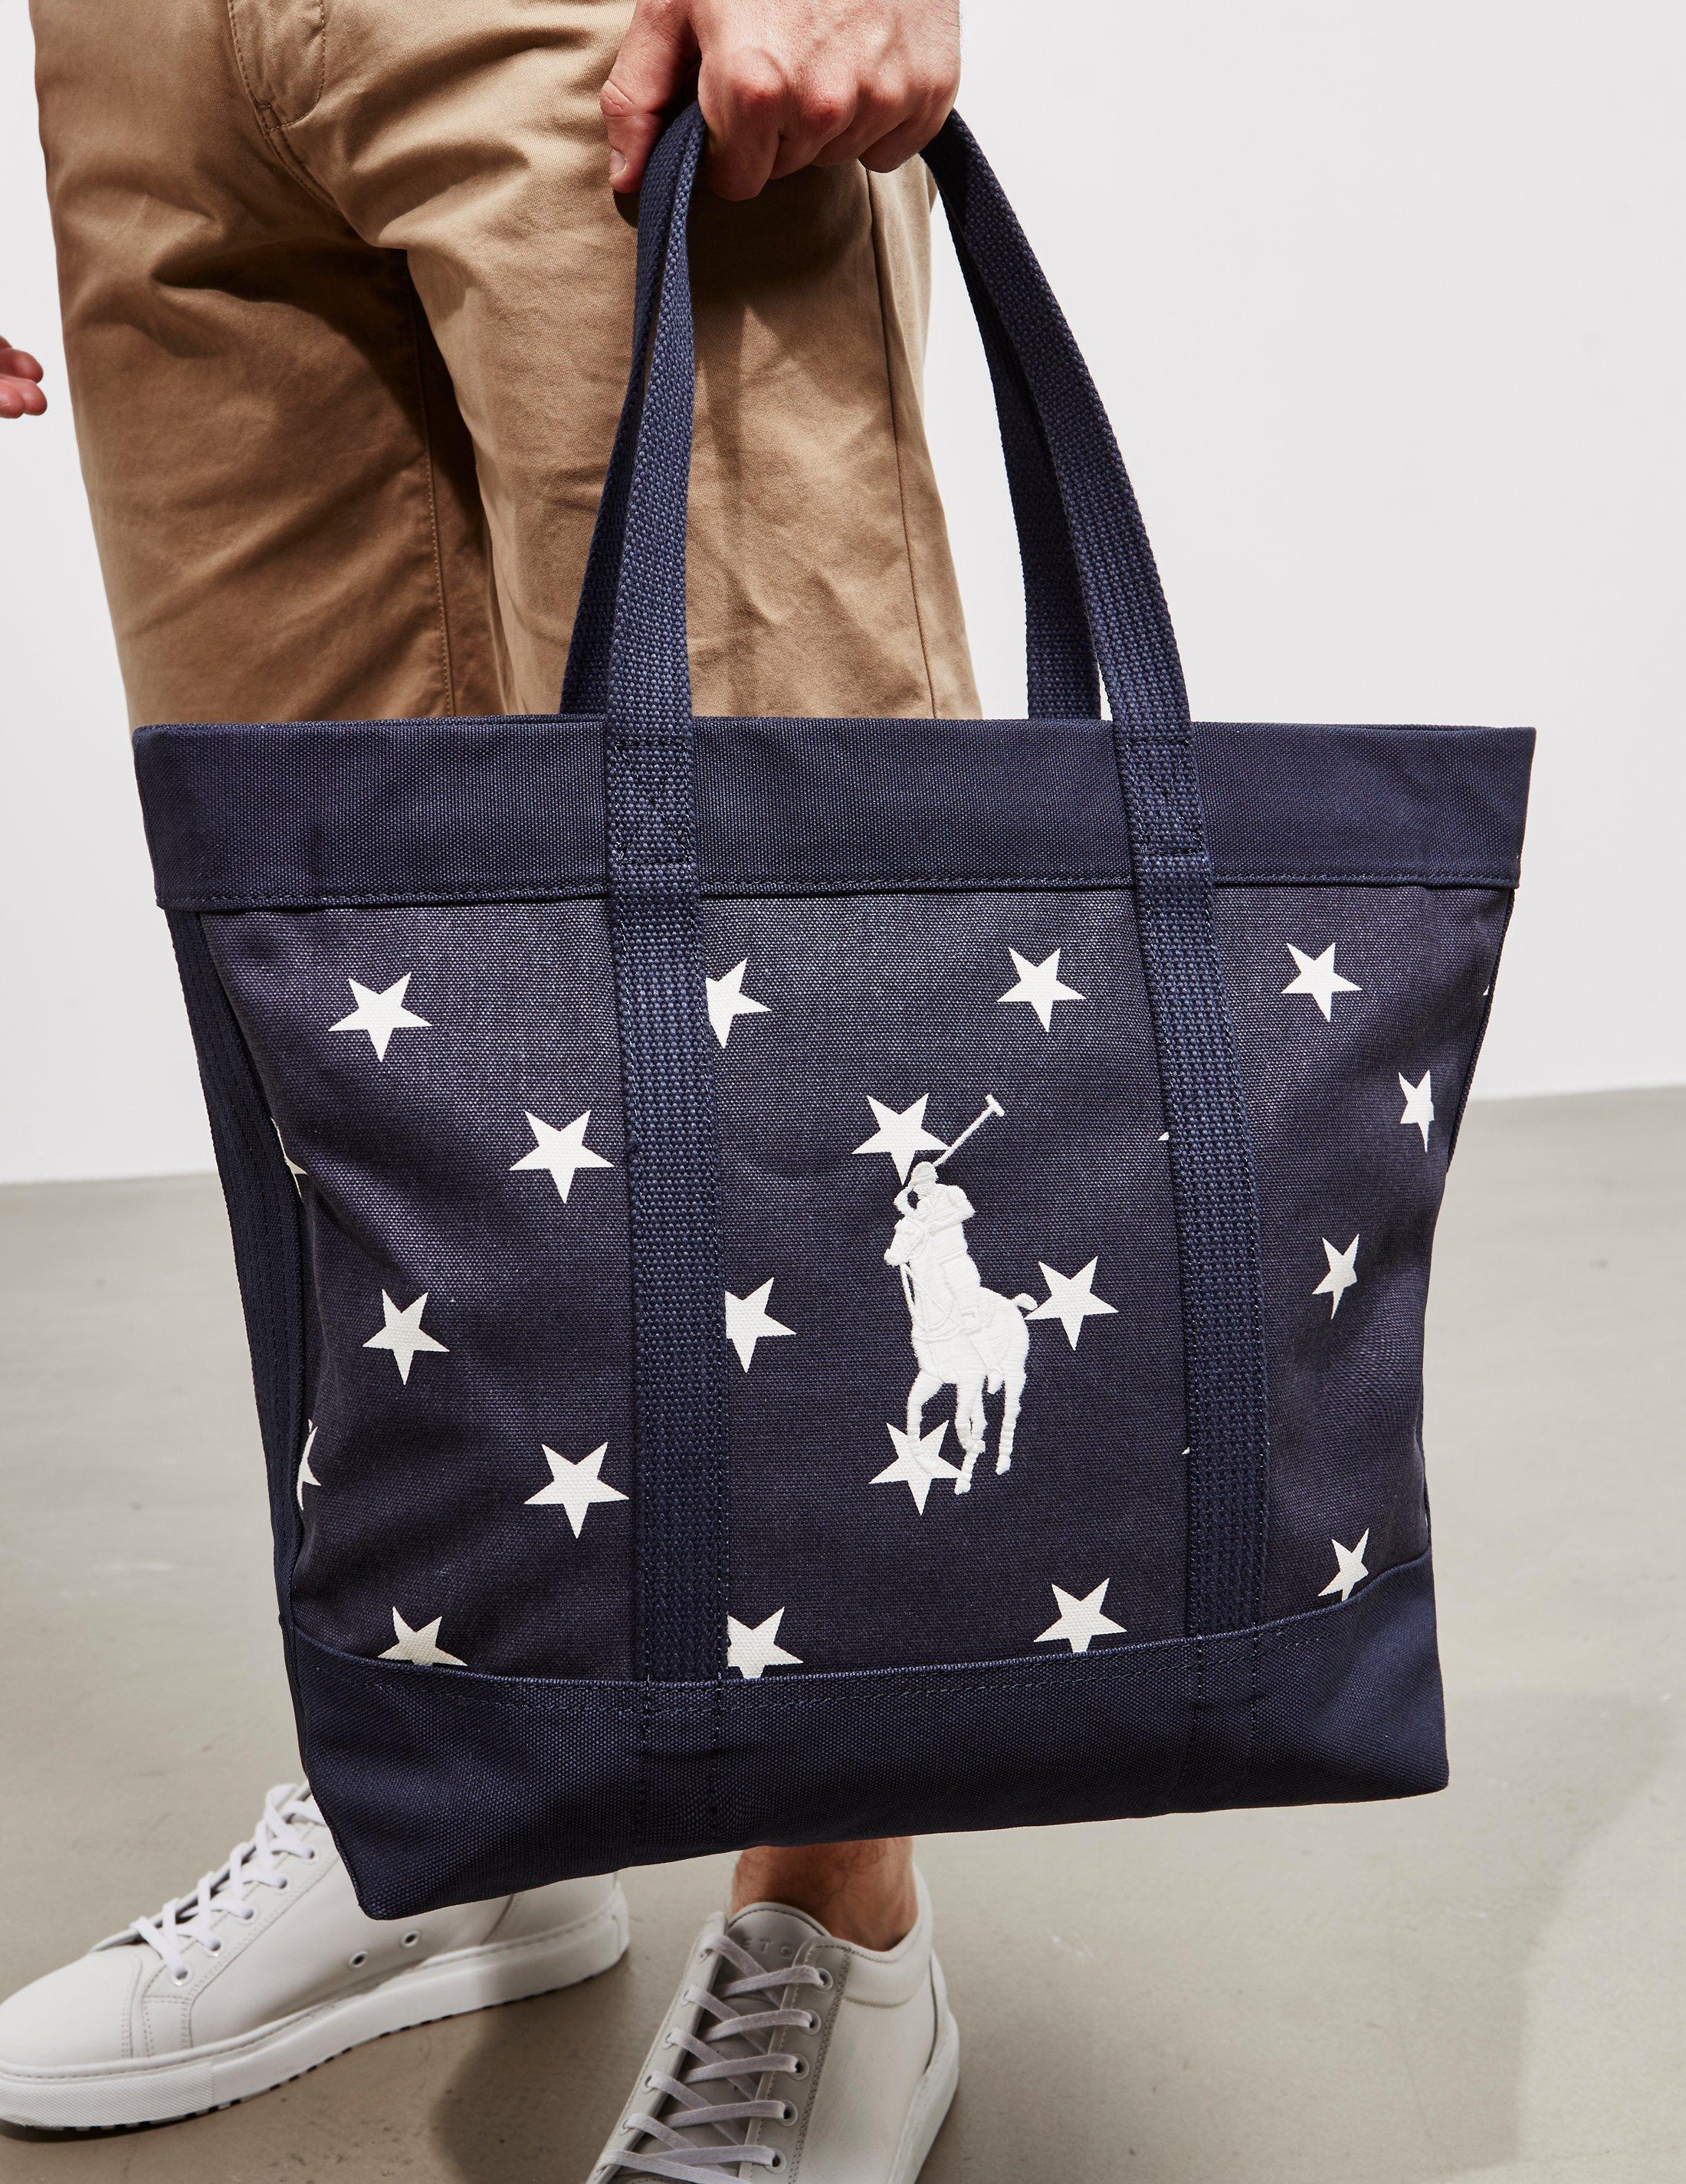 f10fbea48452 Lyst - Polo Ralph Lauren Mens Stars Tote Bag - Online Exclusive Navy ...